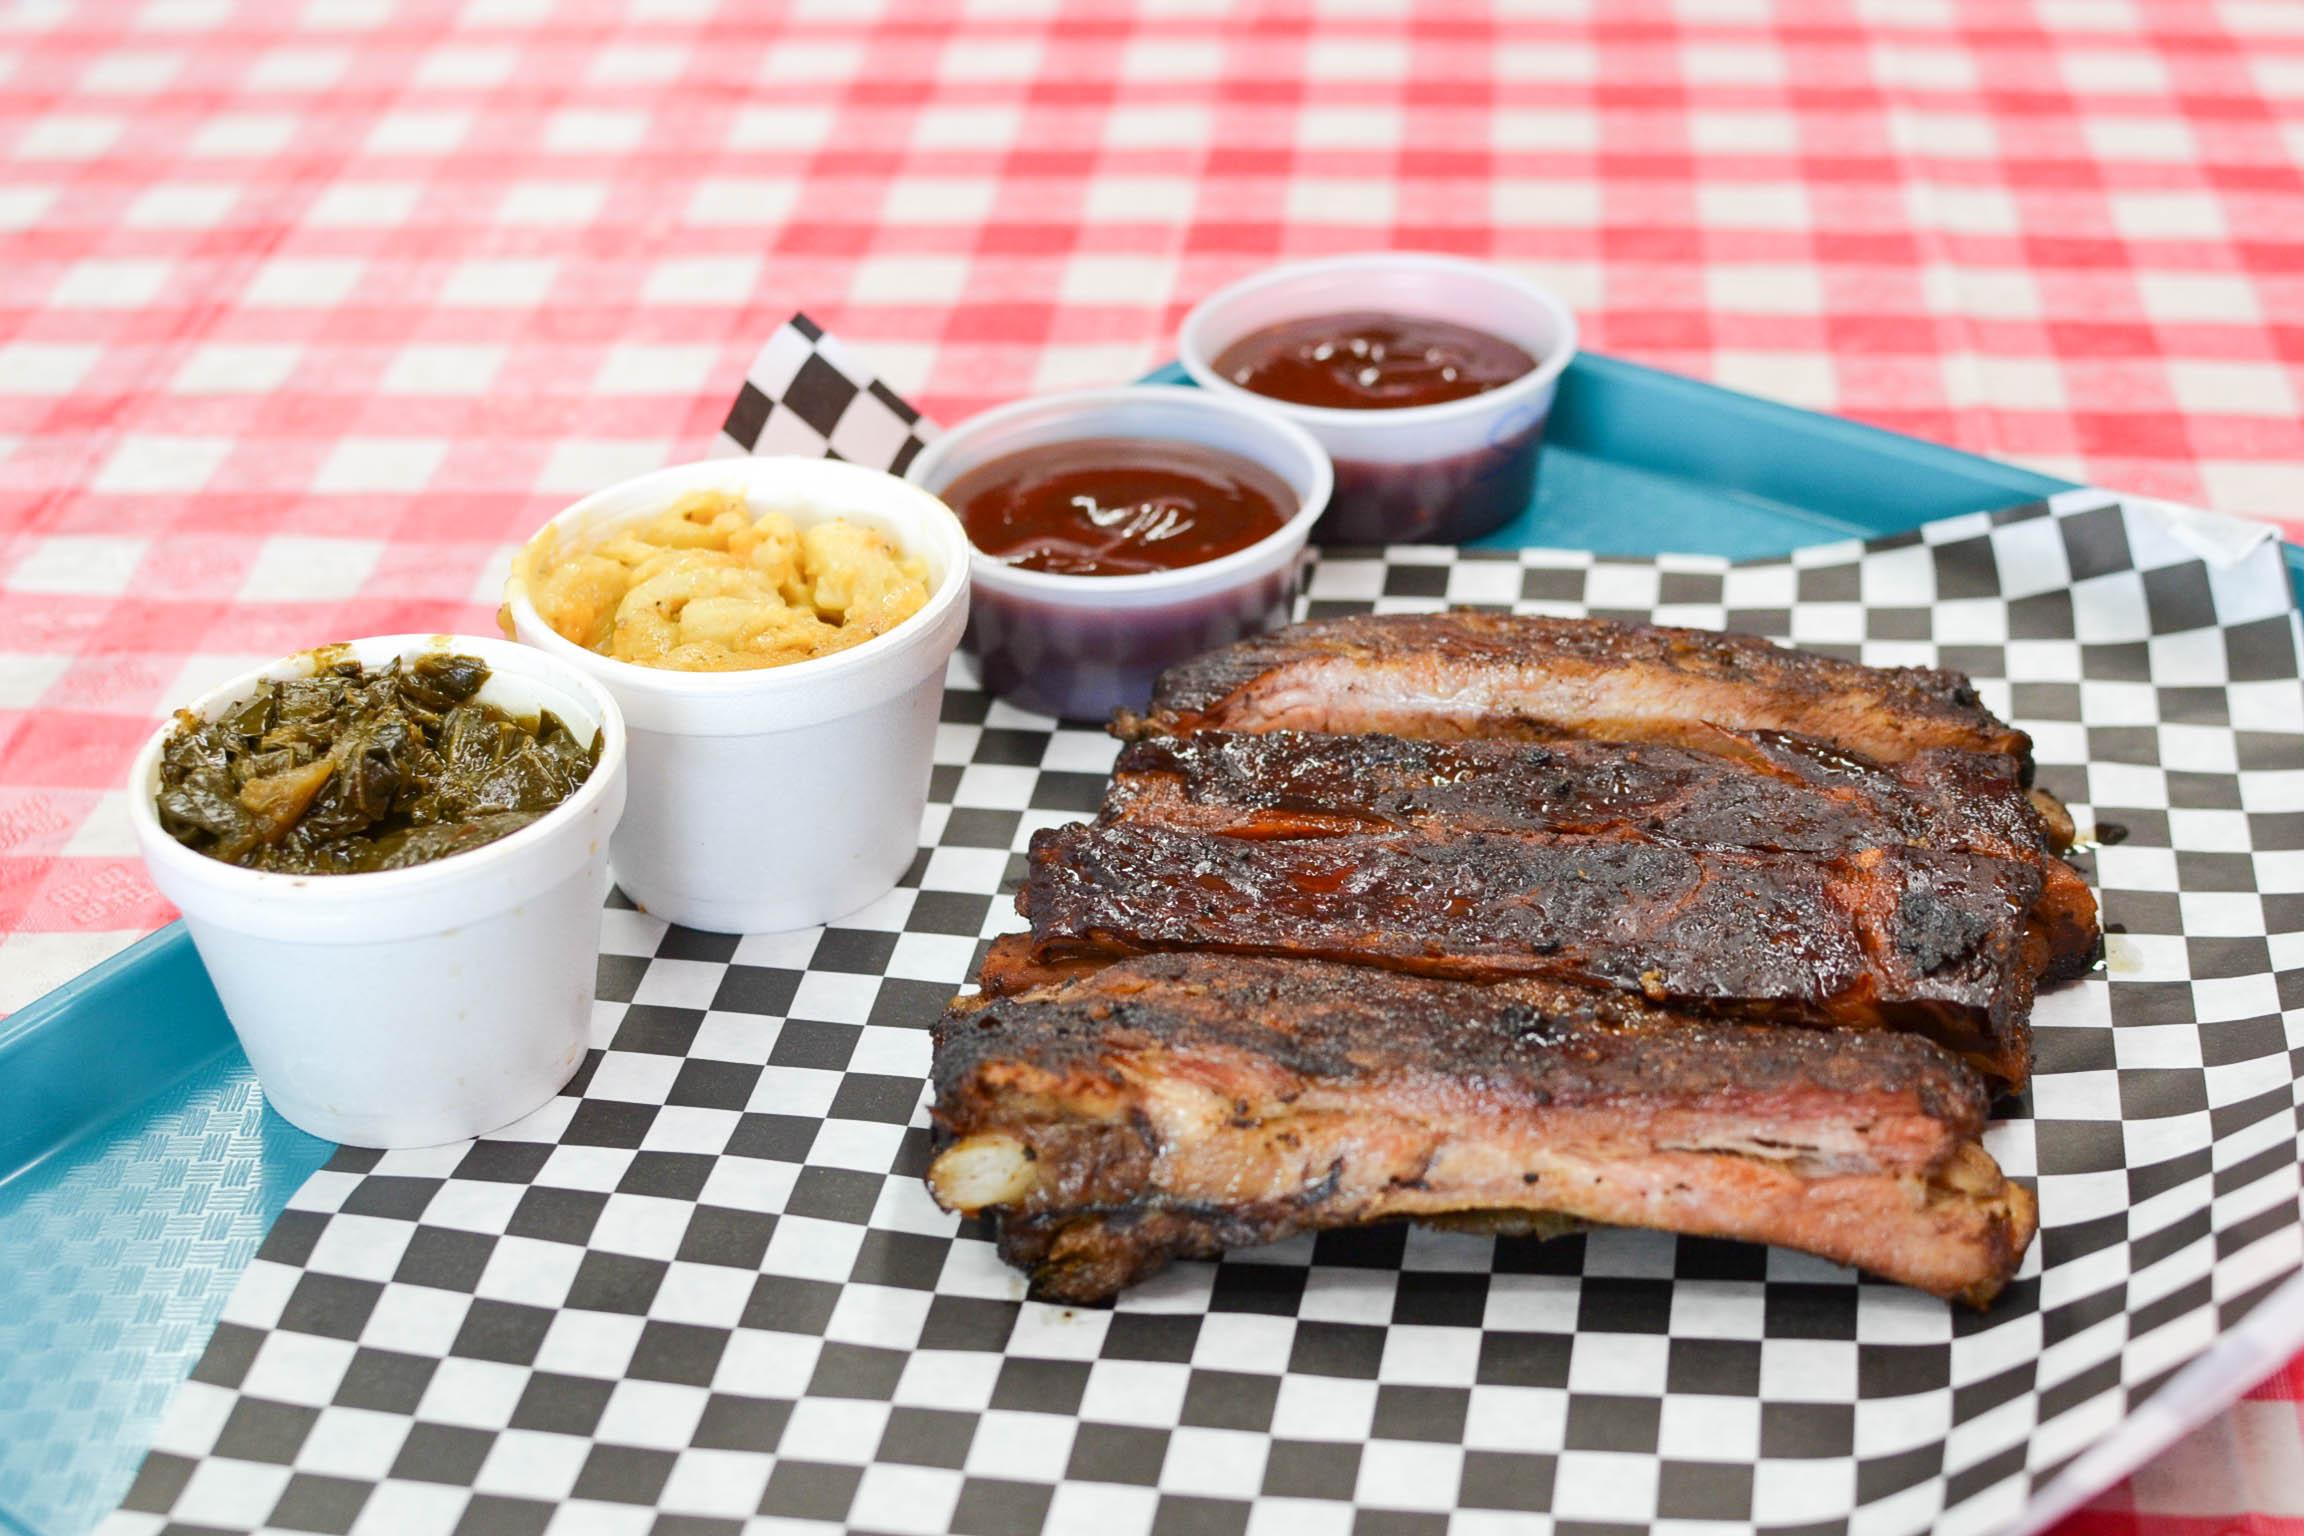 Where to Find LA's Best Barbecue Ribs